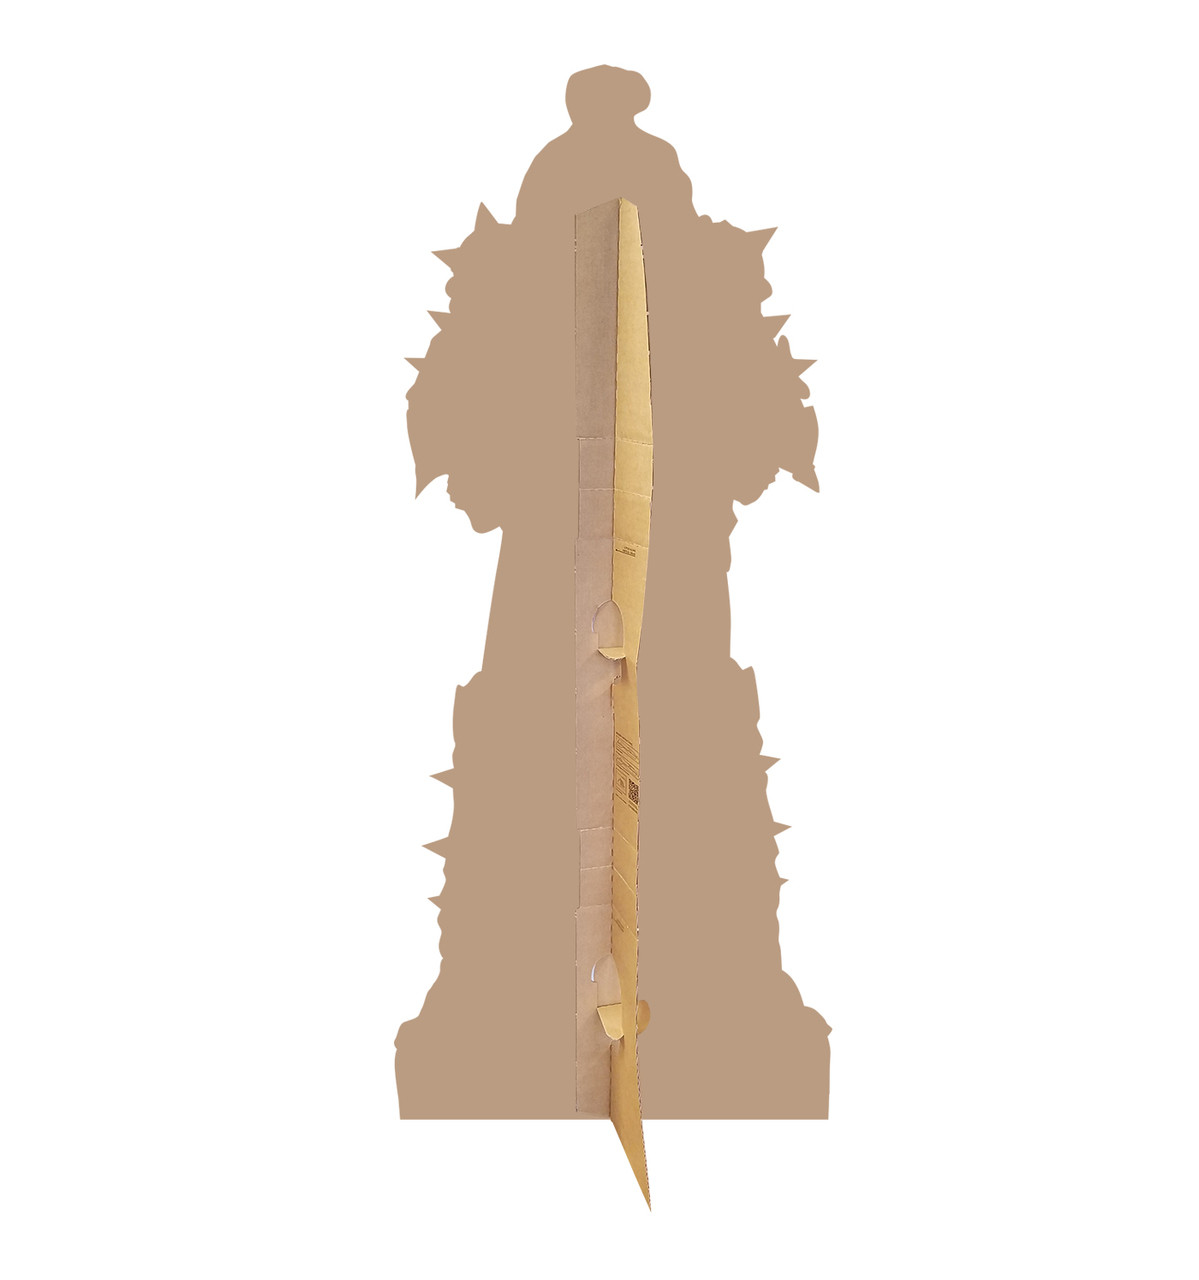 Life-size The Demon (KISS) Cardboard Standup | Cardboard Cutout